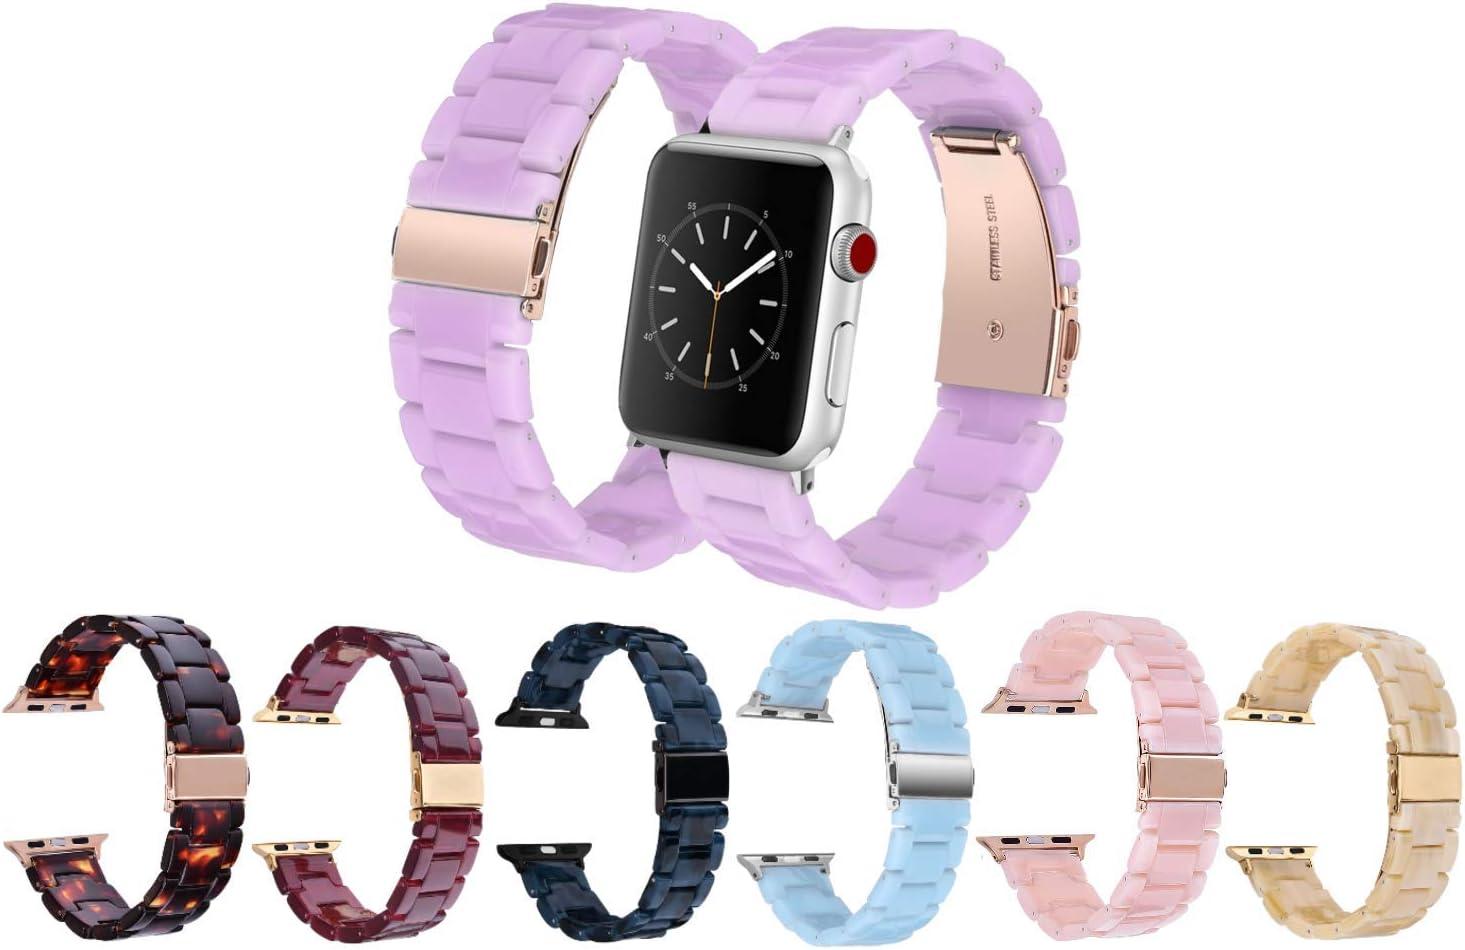 Mobile Advance Resin Band Bracelet for Apple Watch Series 6/SE/5/4/3/2/1 (Purple, 38mm/40mm)